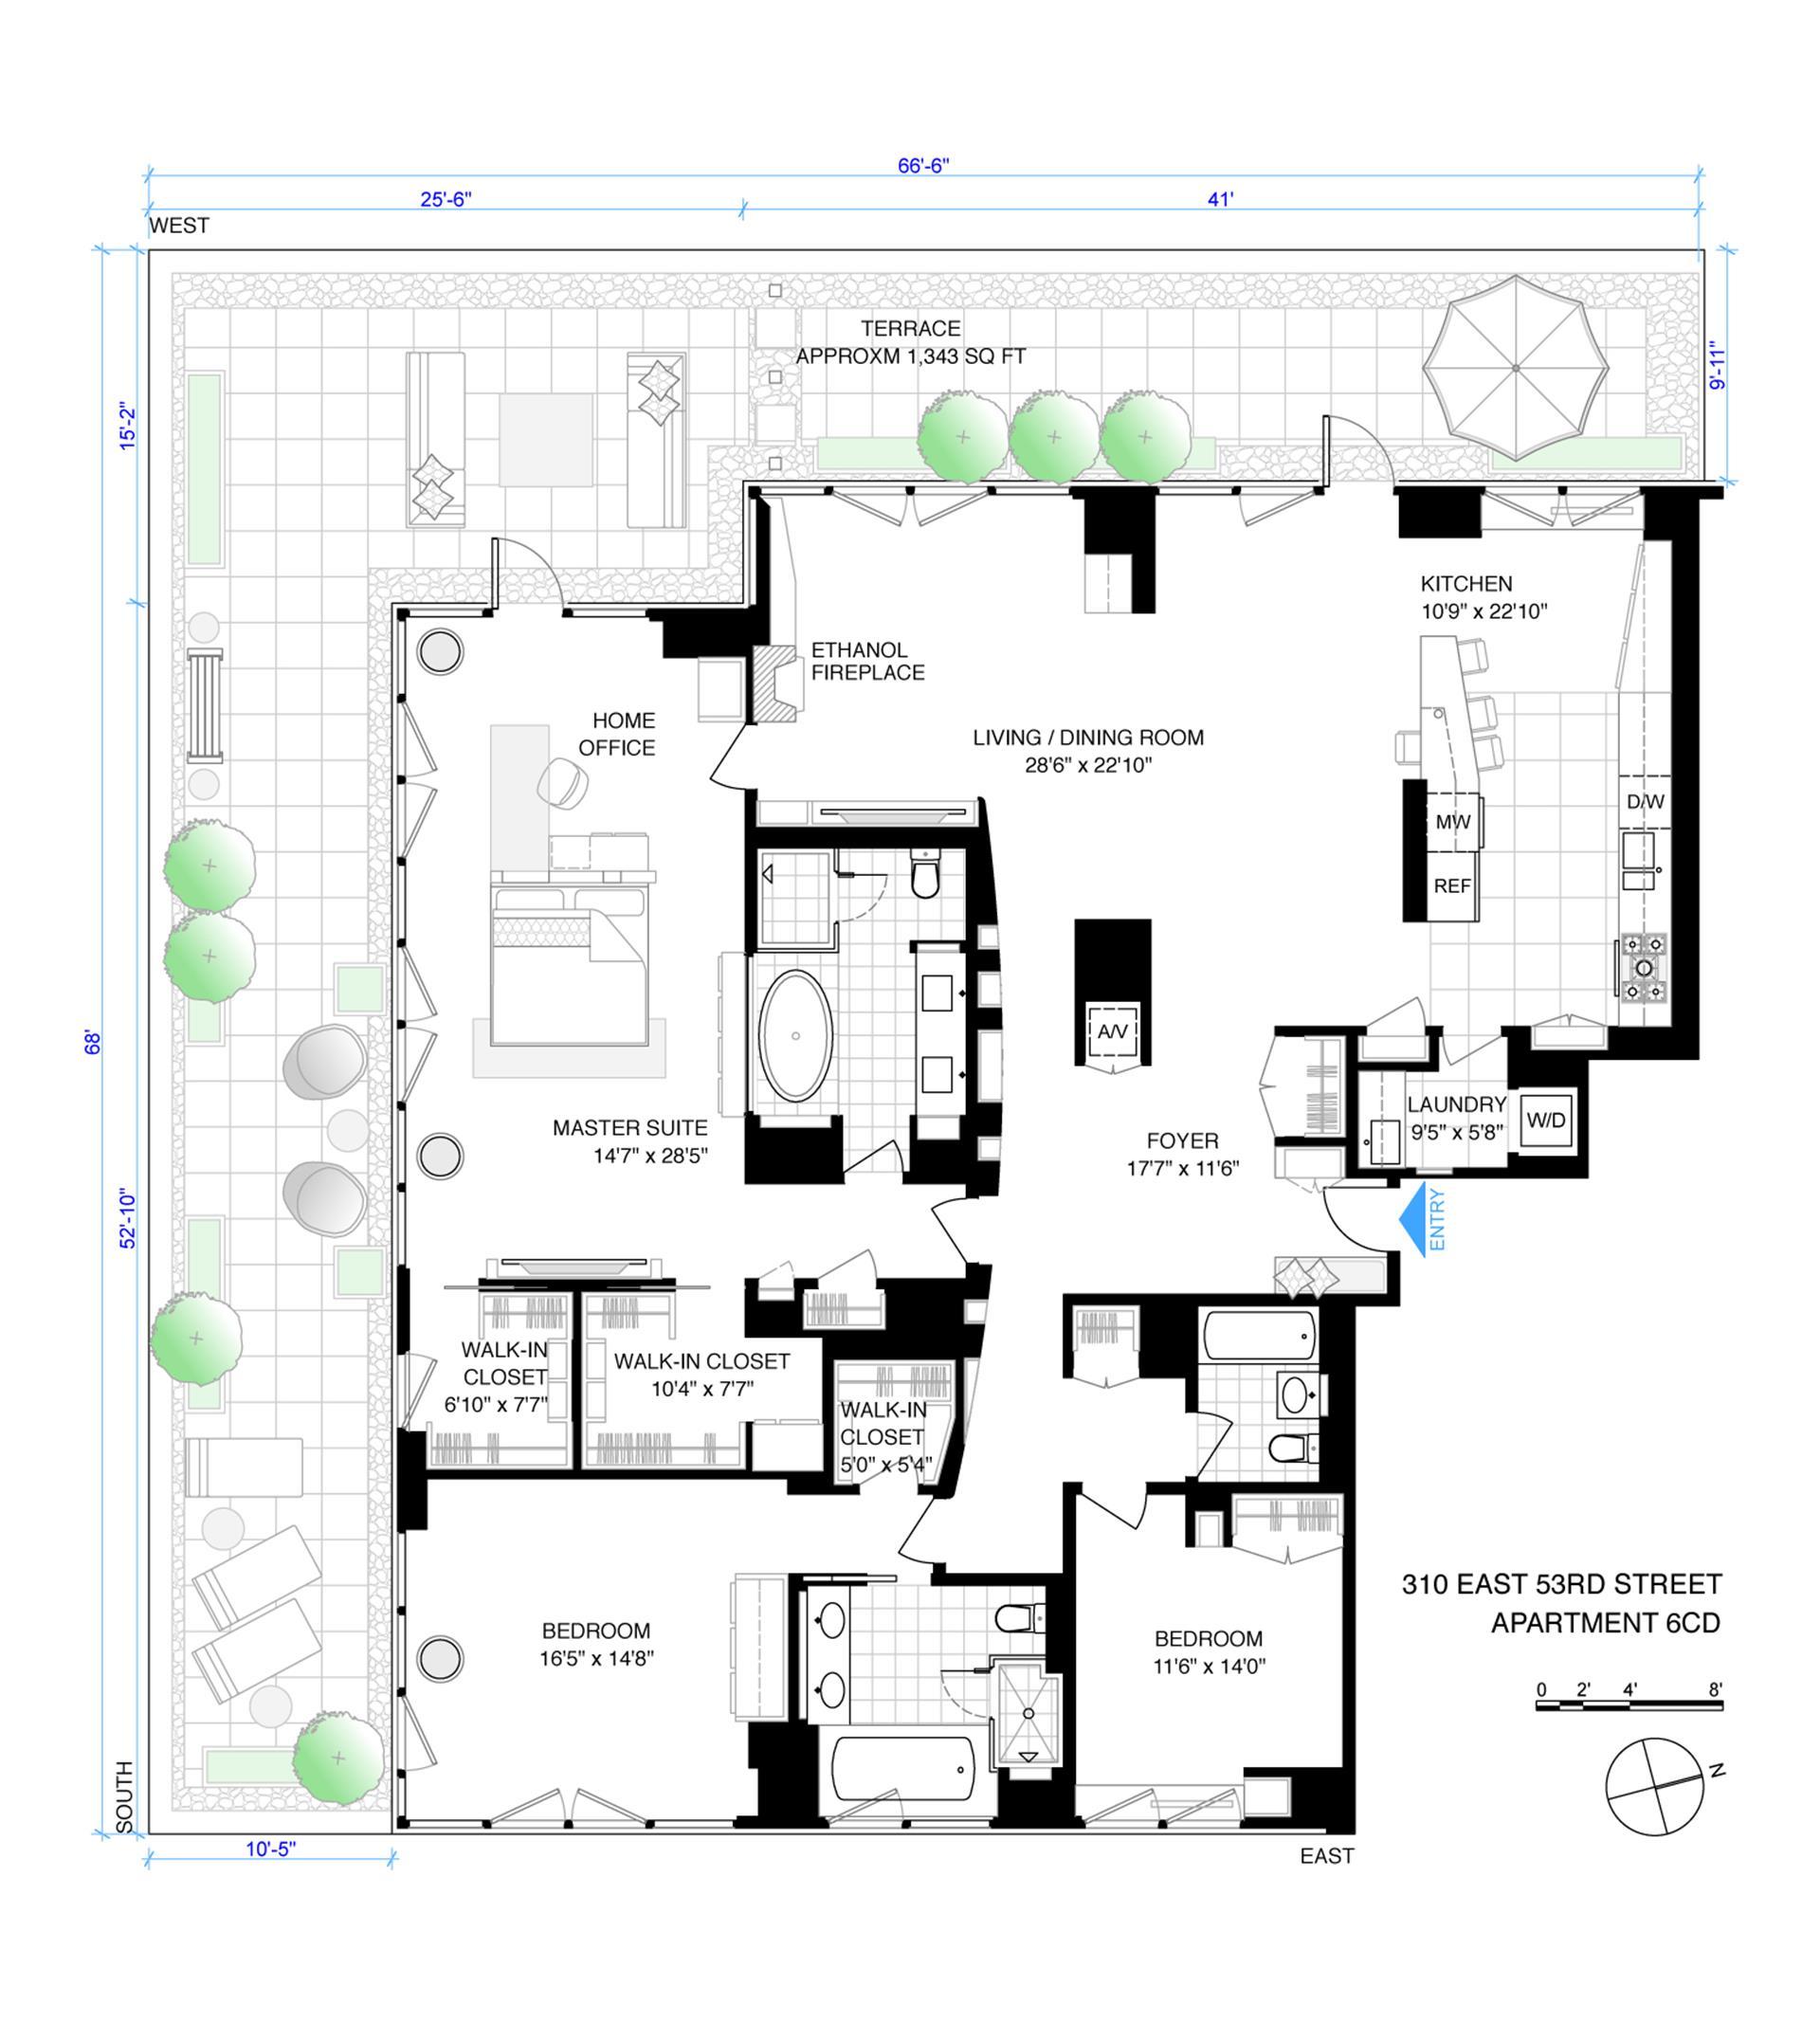 Floor plan of The Three Ten, 310 East 53rd St, 6CD - Sutton Area, New York